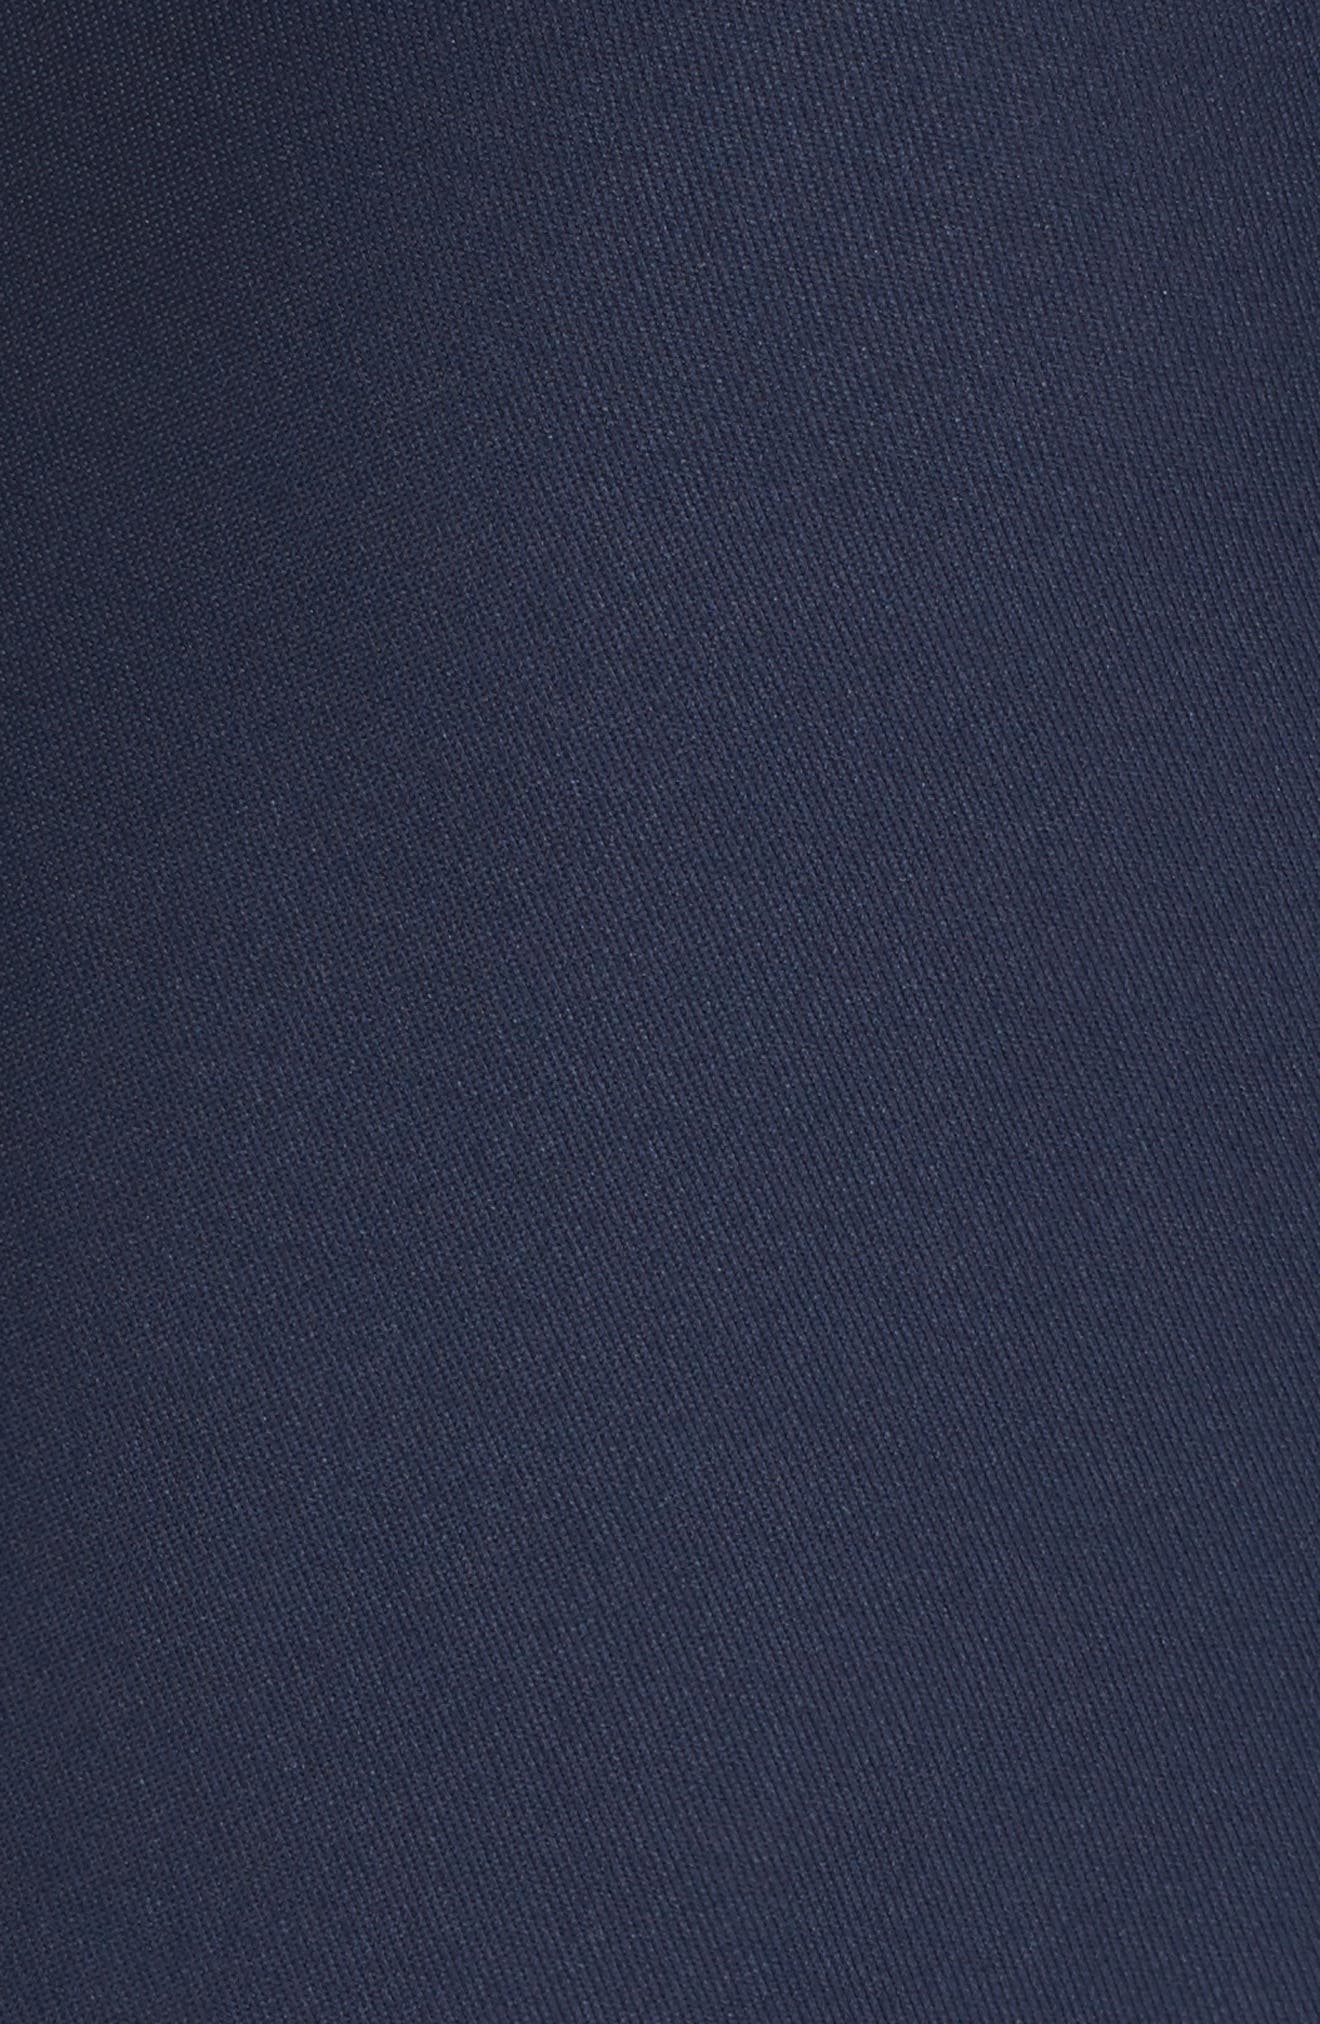 Alternate Image 5  - Cooper St Azalea Flounce Hem Dress (Plus Size)